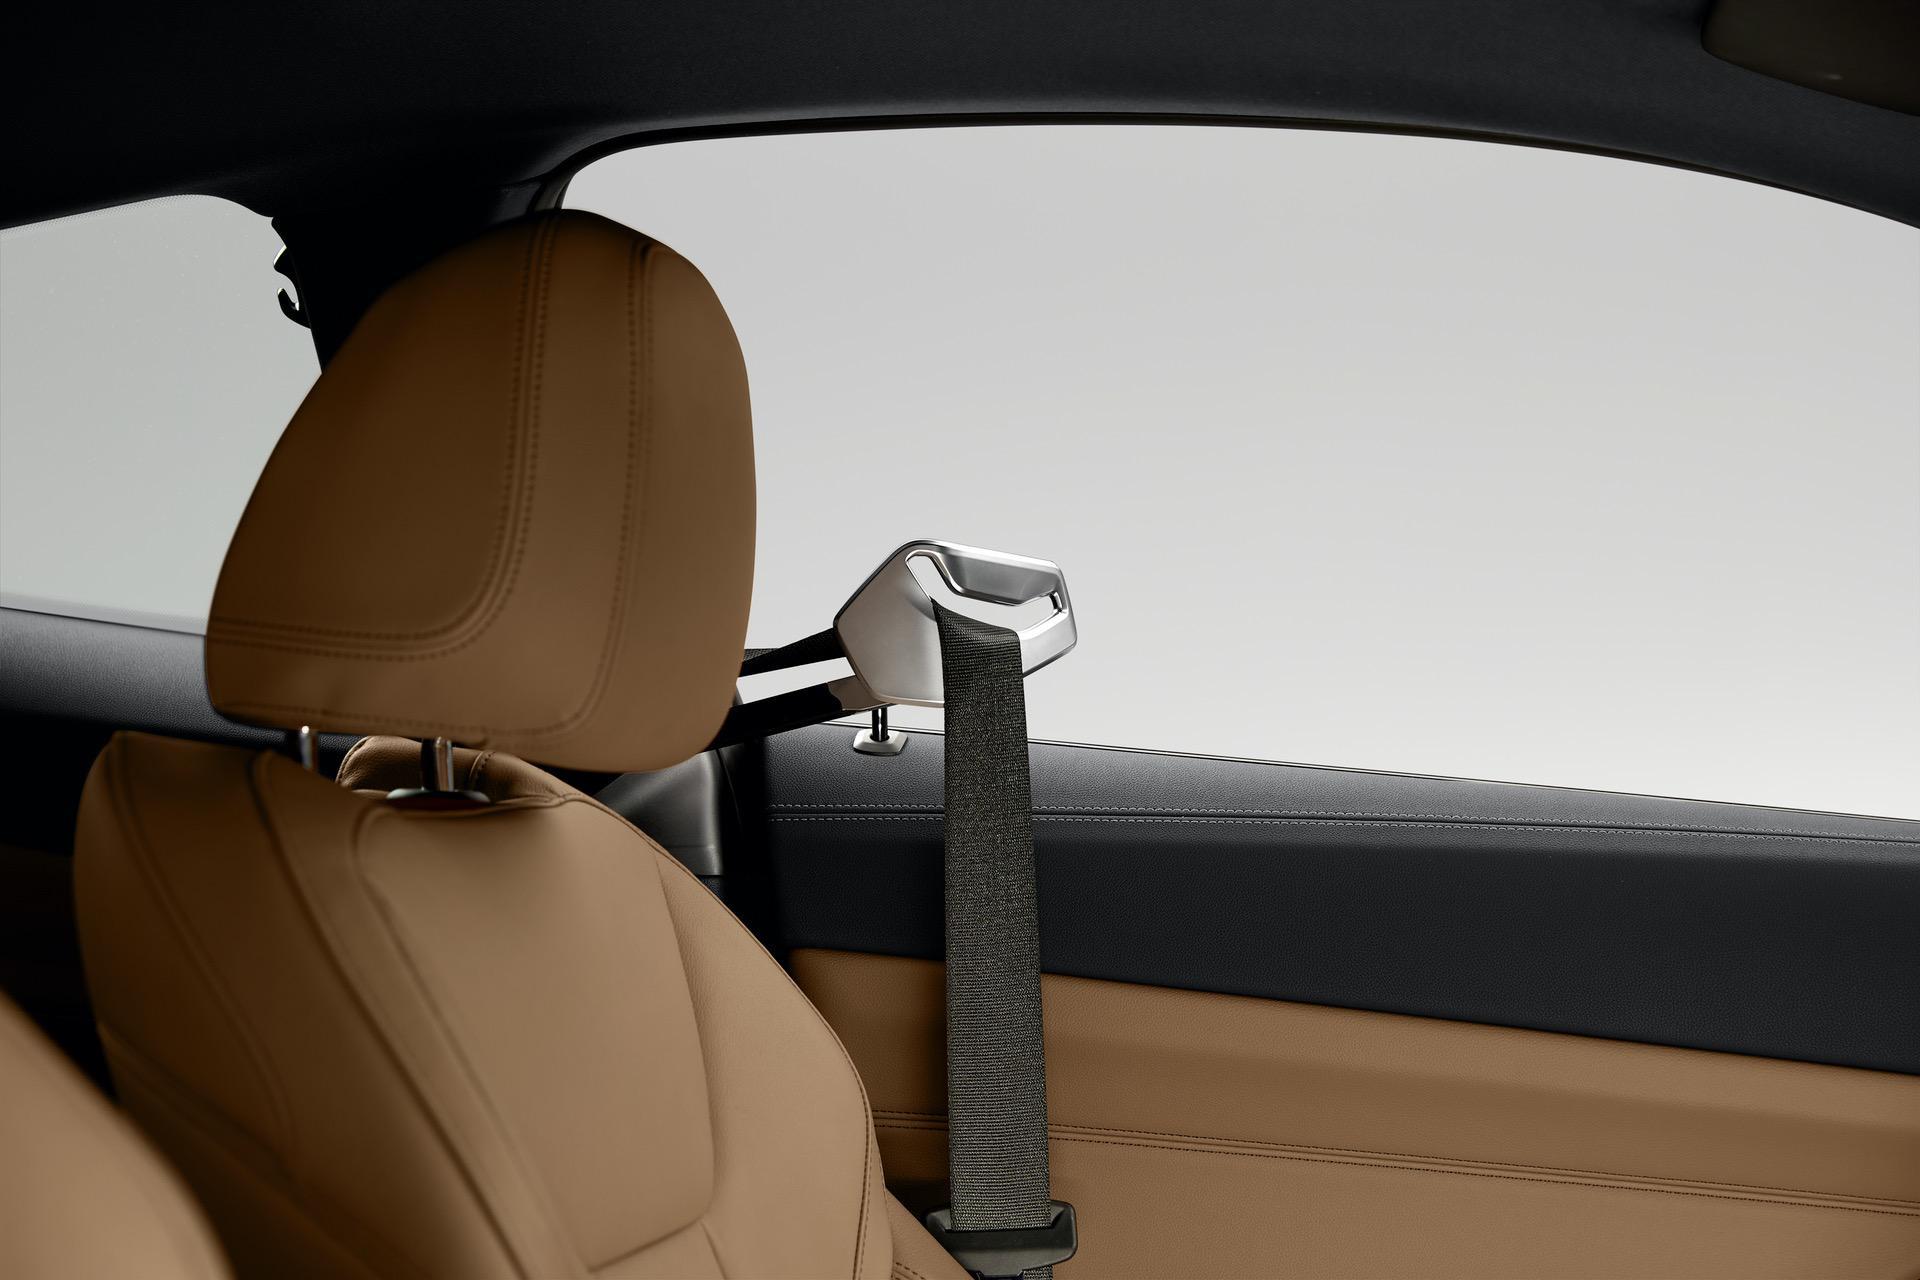 2021 bmw 4 series interior 06